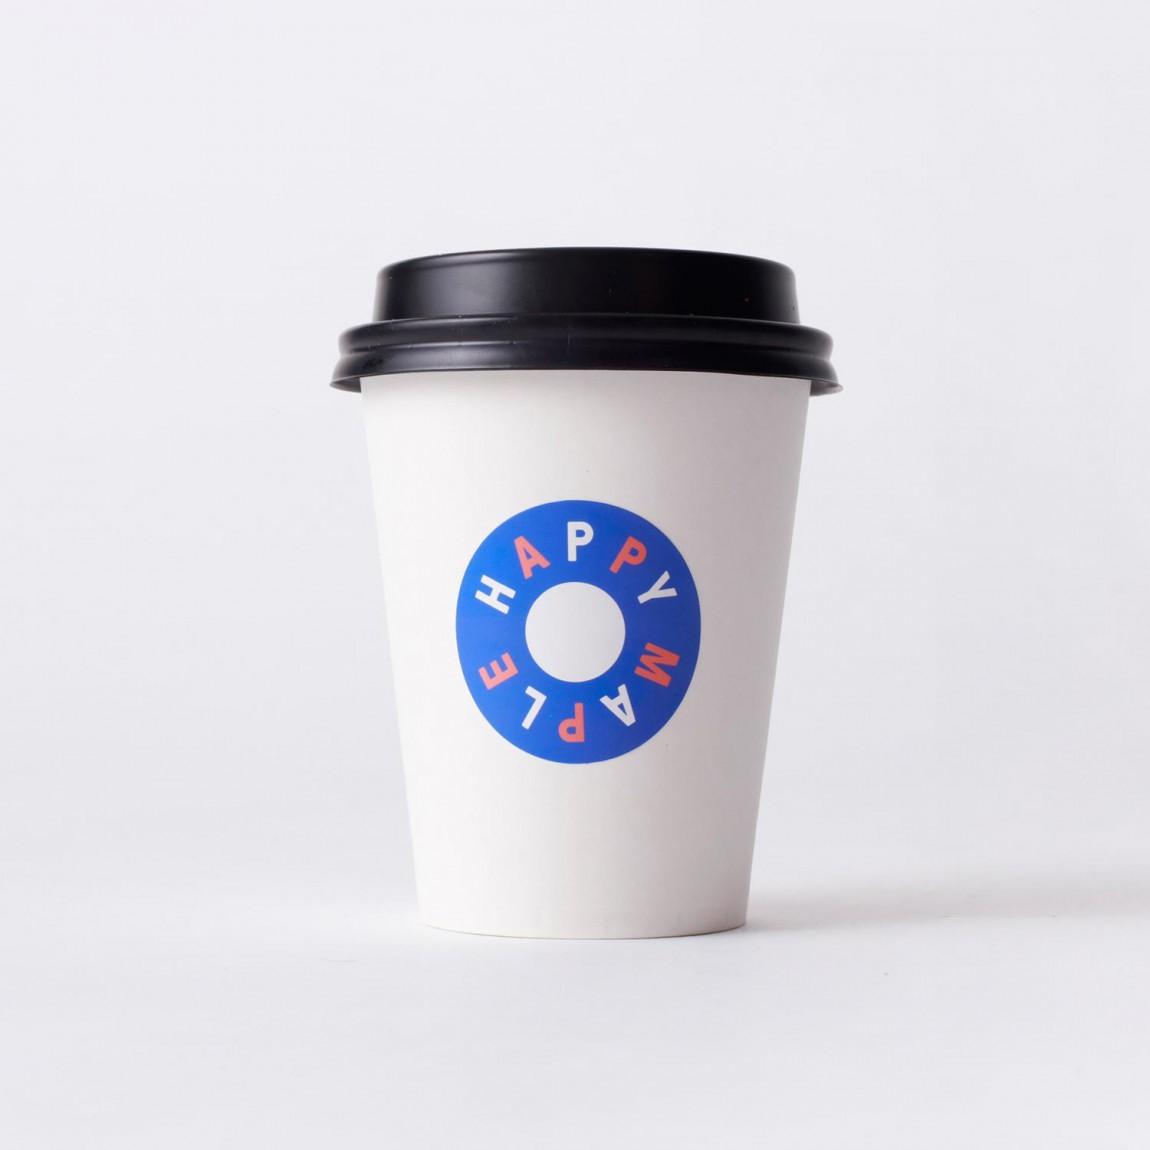 包房Happy Maple面包店连锁品牌形象设计,饮料杯设计